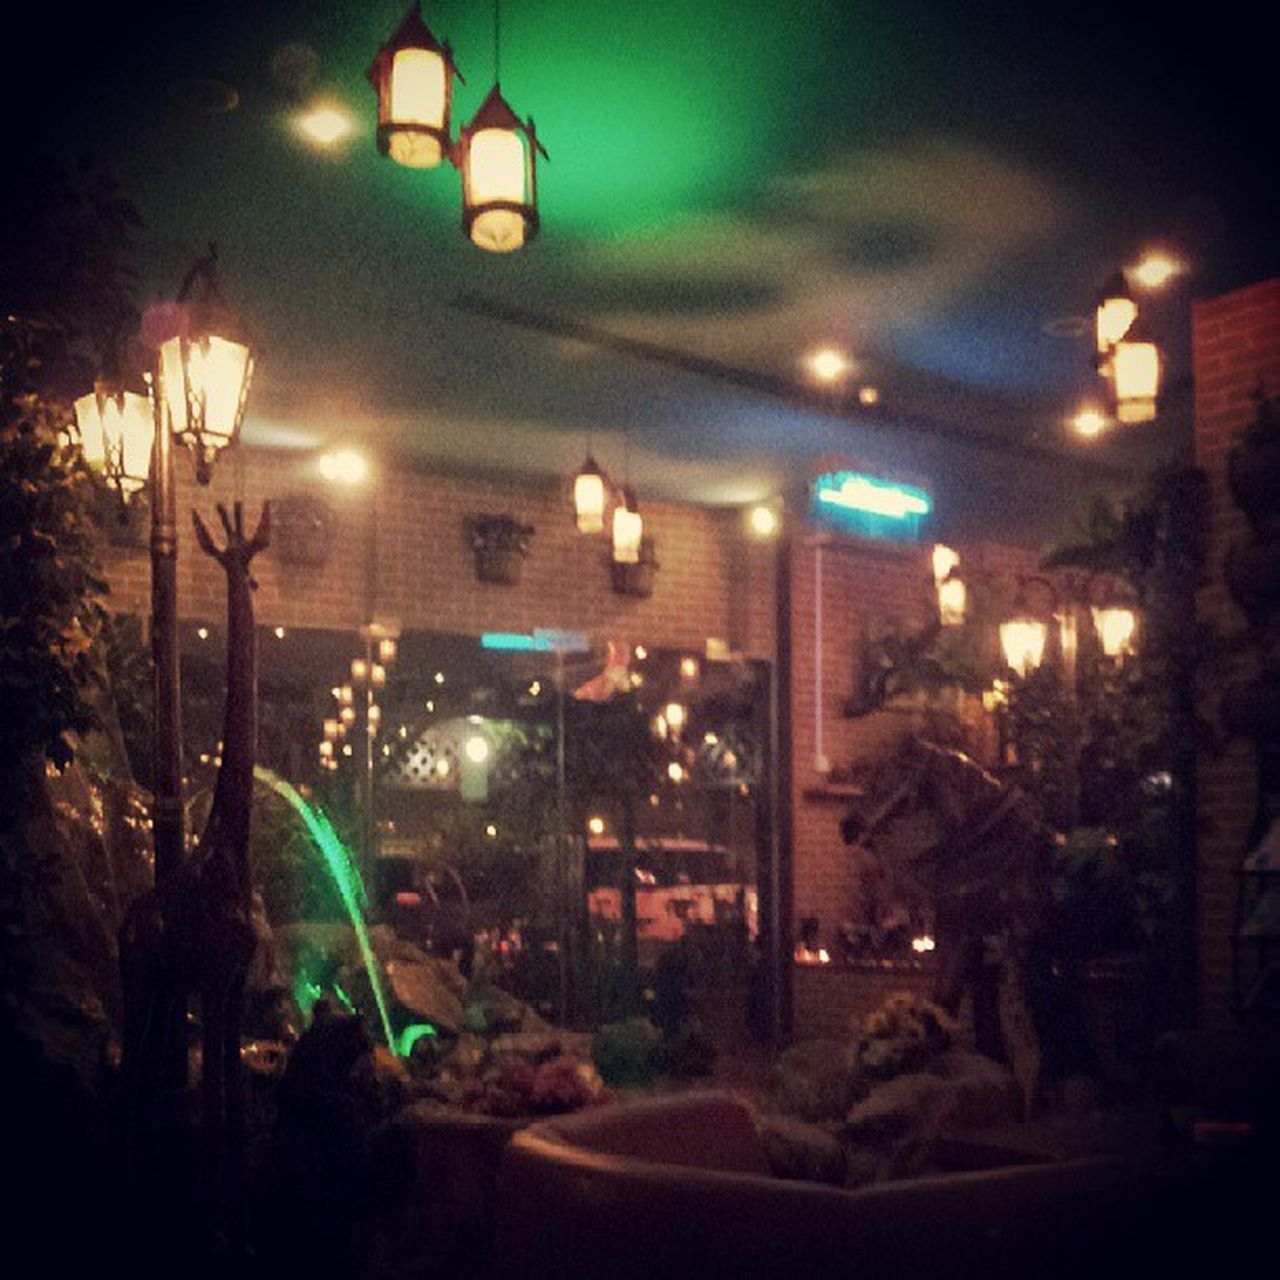 Valleycafe Dubai